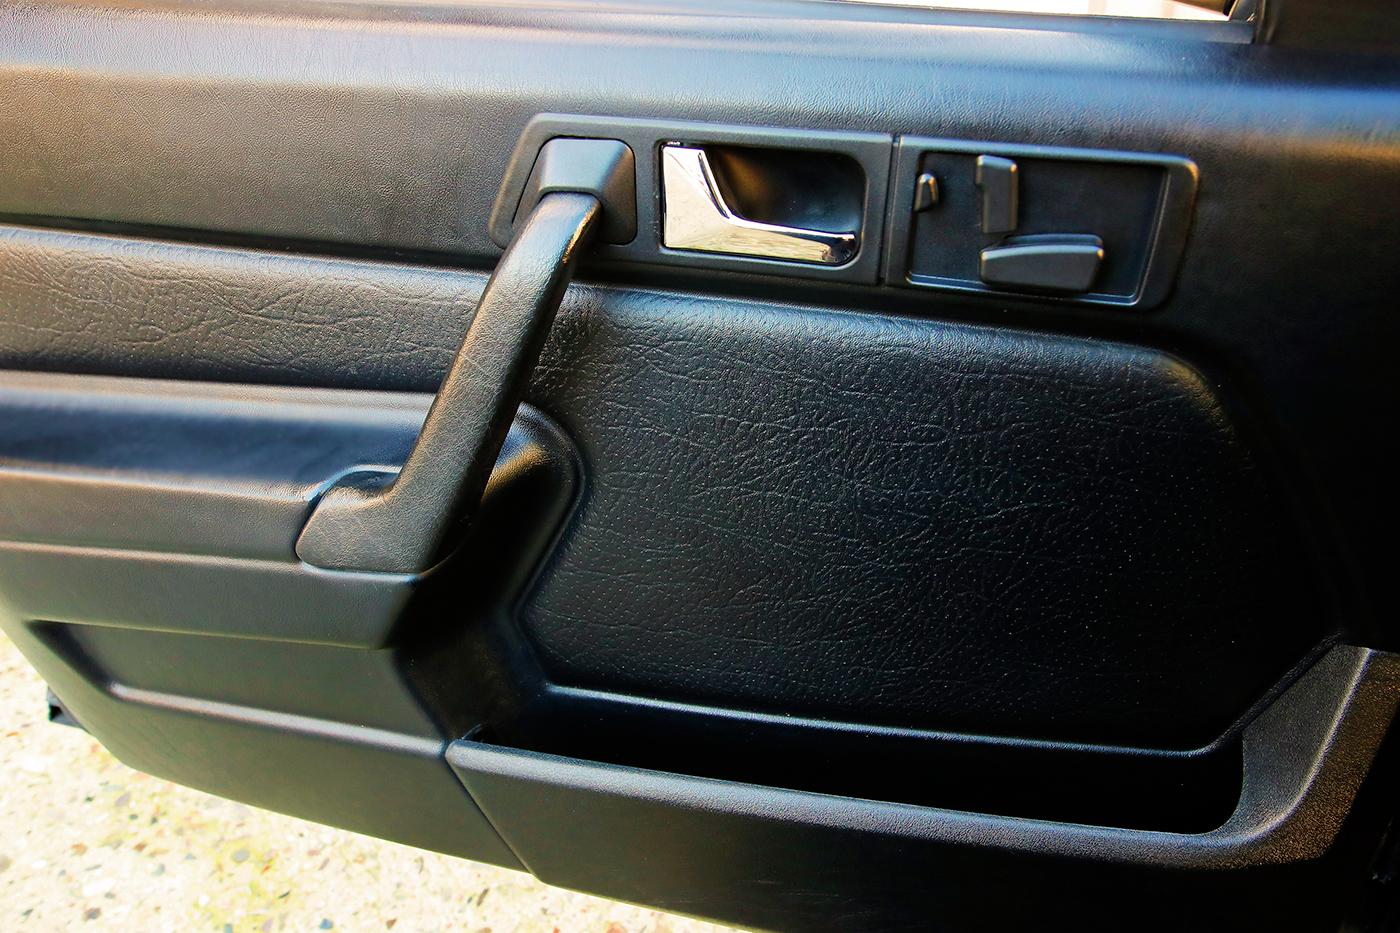 1990_Mercedes-Benz_190E_2.5-16_Evolution_II_0028